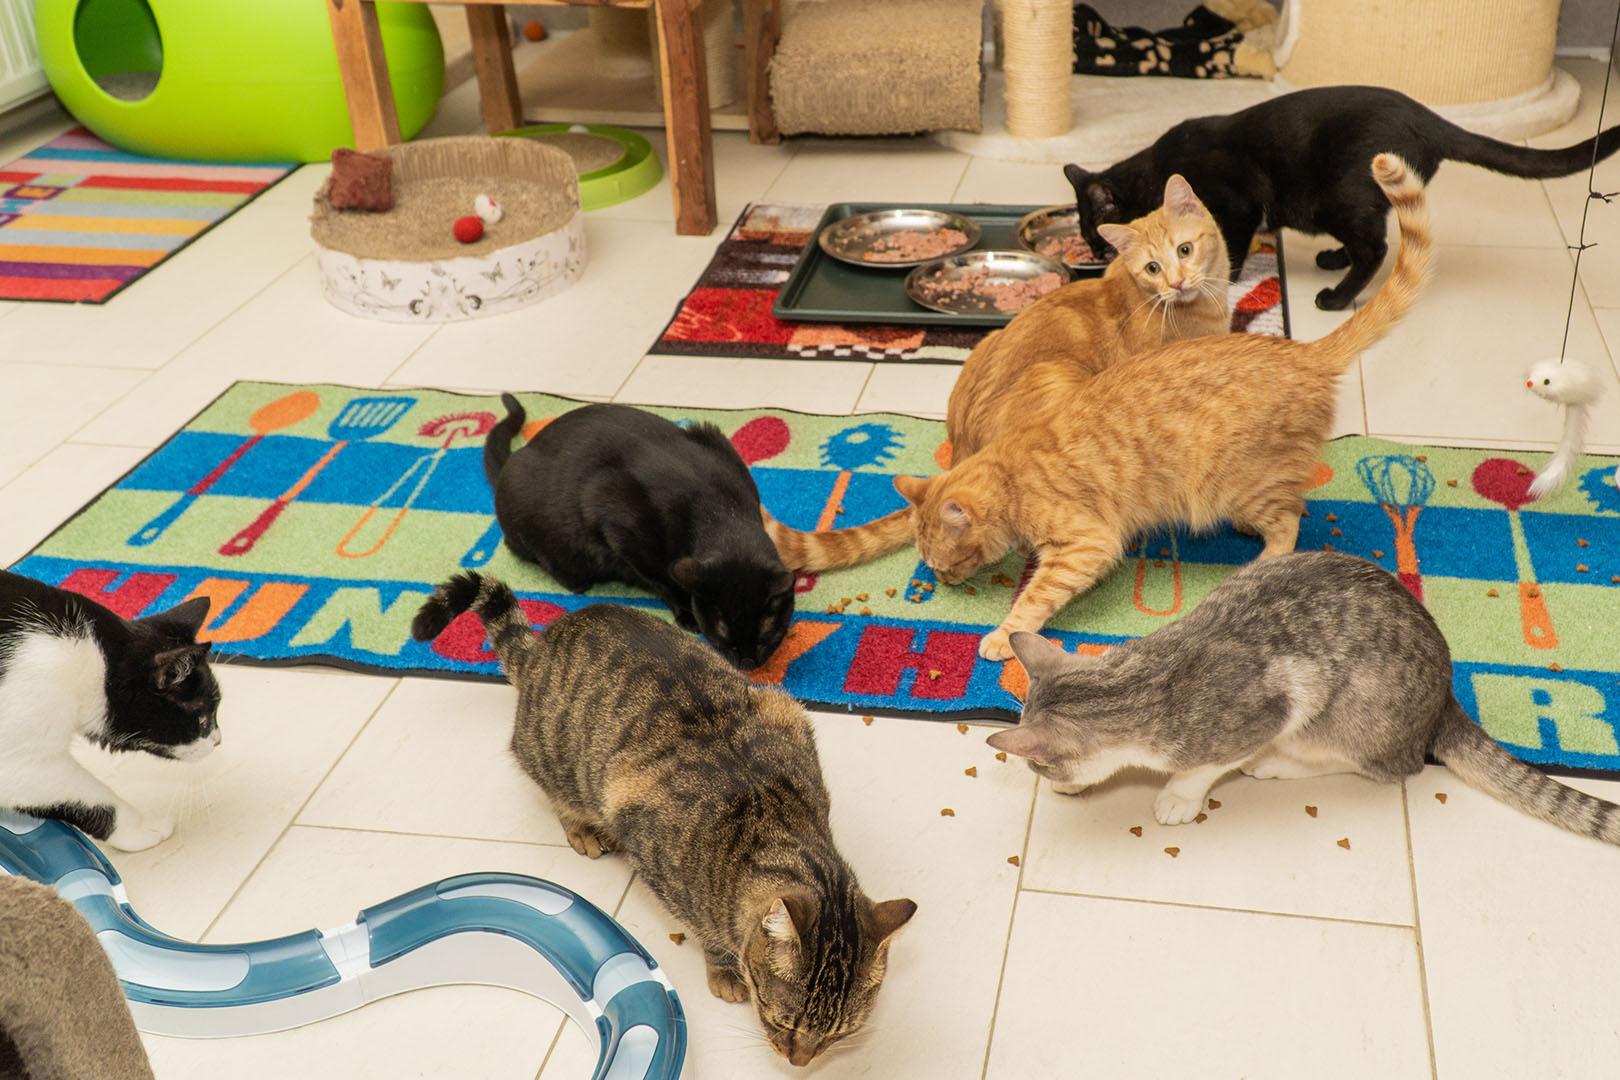 Pflegekatzen Startseite 30.10.18 (14)